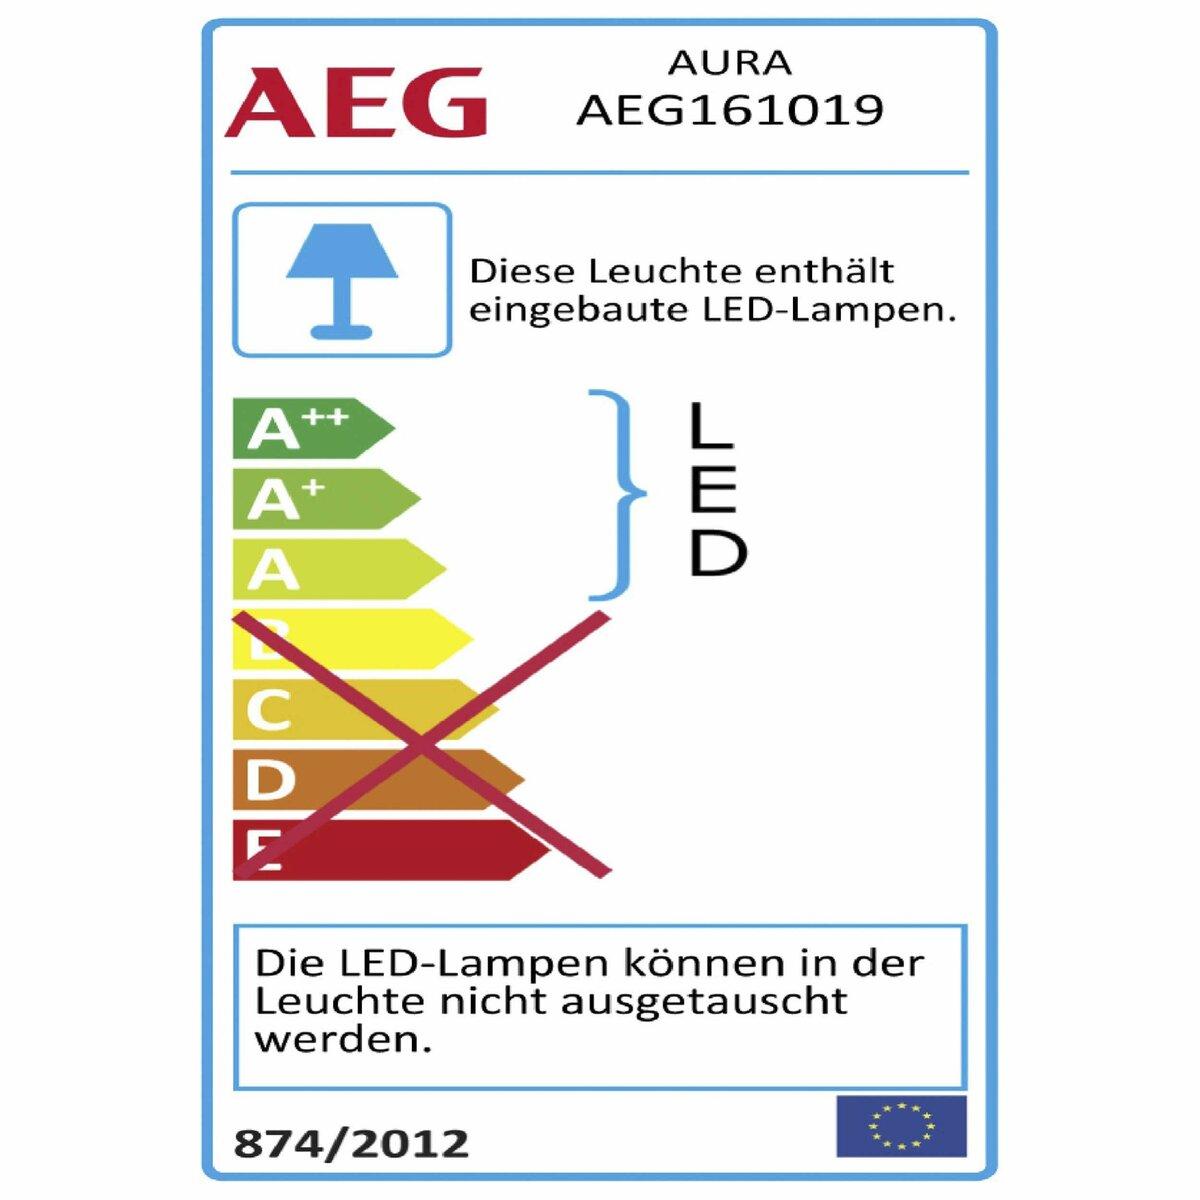 Bild 5 von AEG LED-Pendelleuchte   Aura